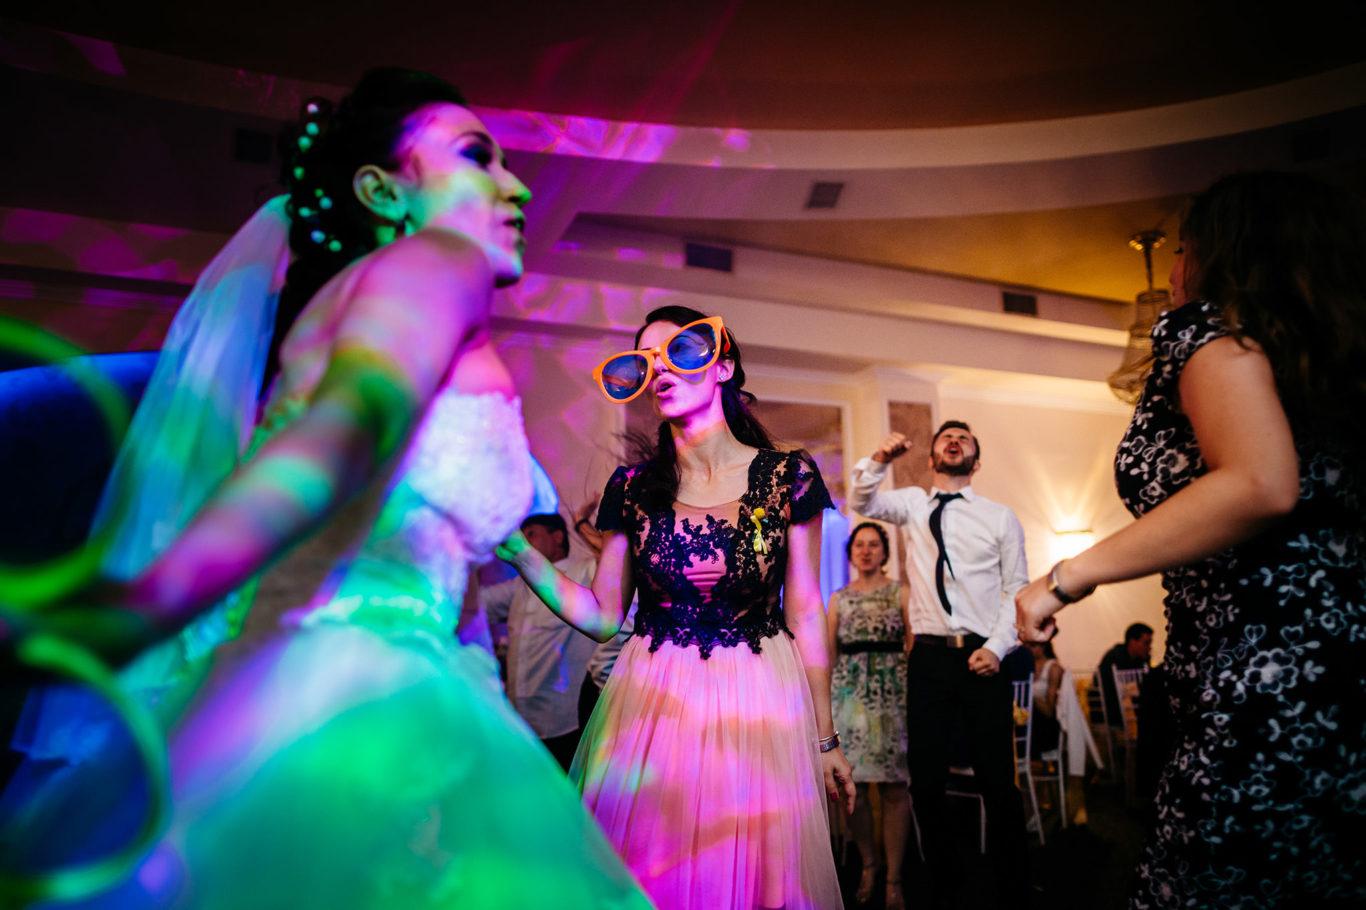 0669-fotografie-nunta-bucuresti-cristina-nicusor-fotograf-ciprian-dumitrescu-dc1_0479-2